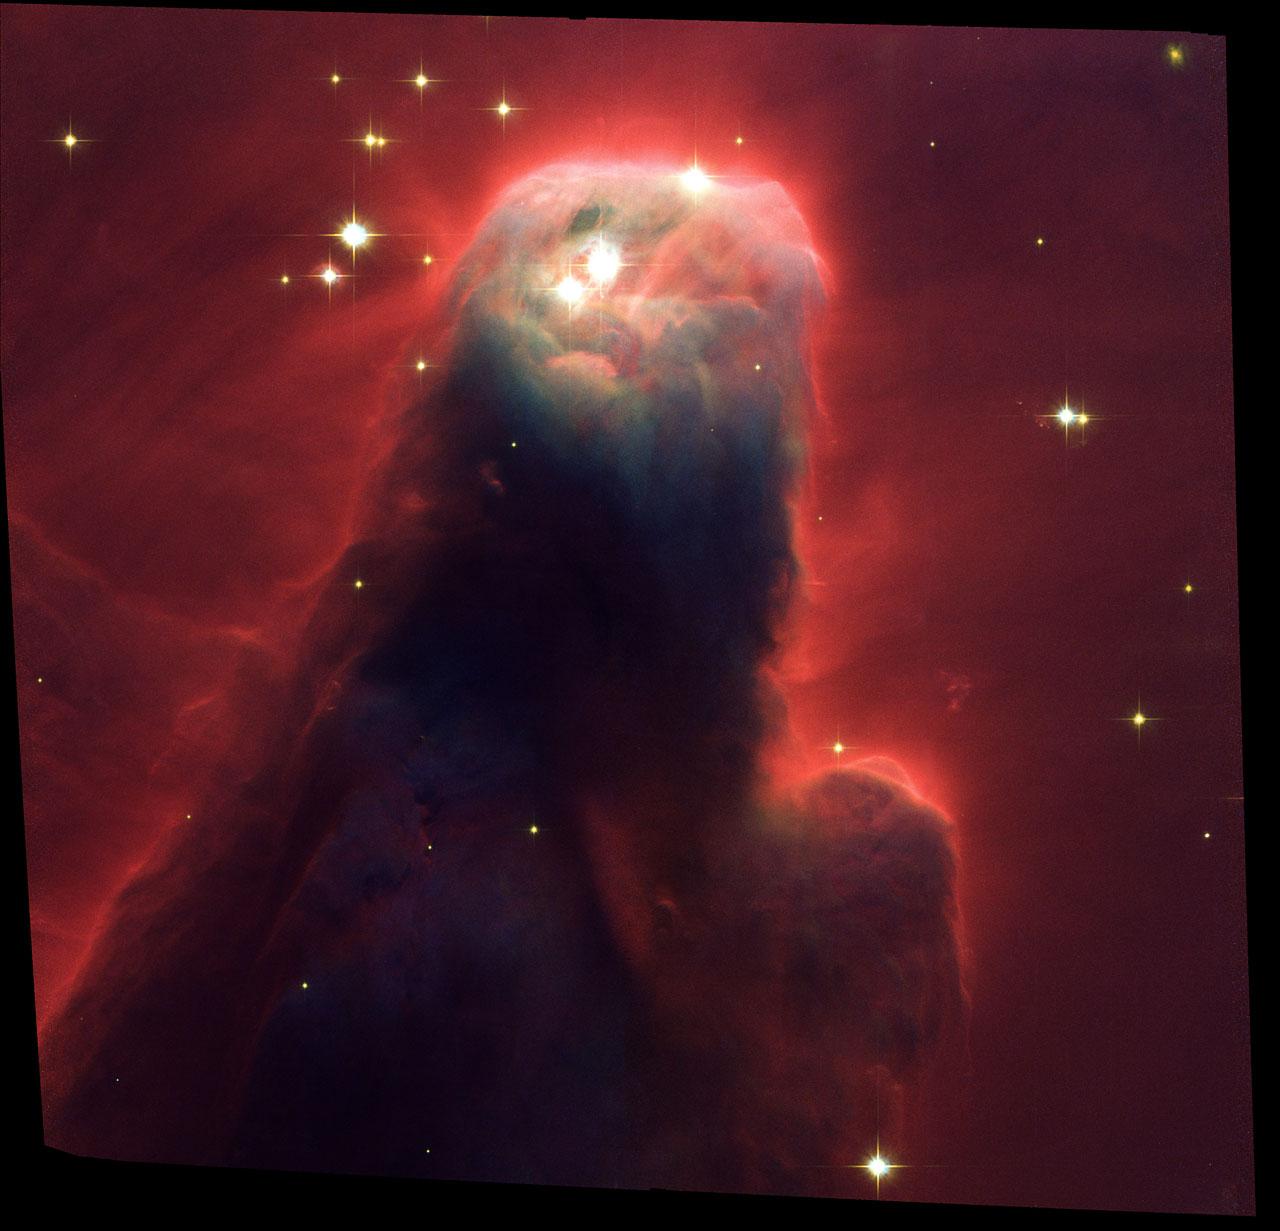 hubble space telescope news - photo #30